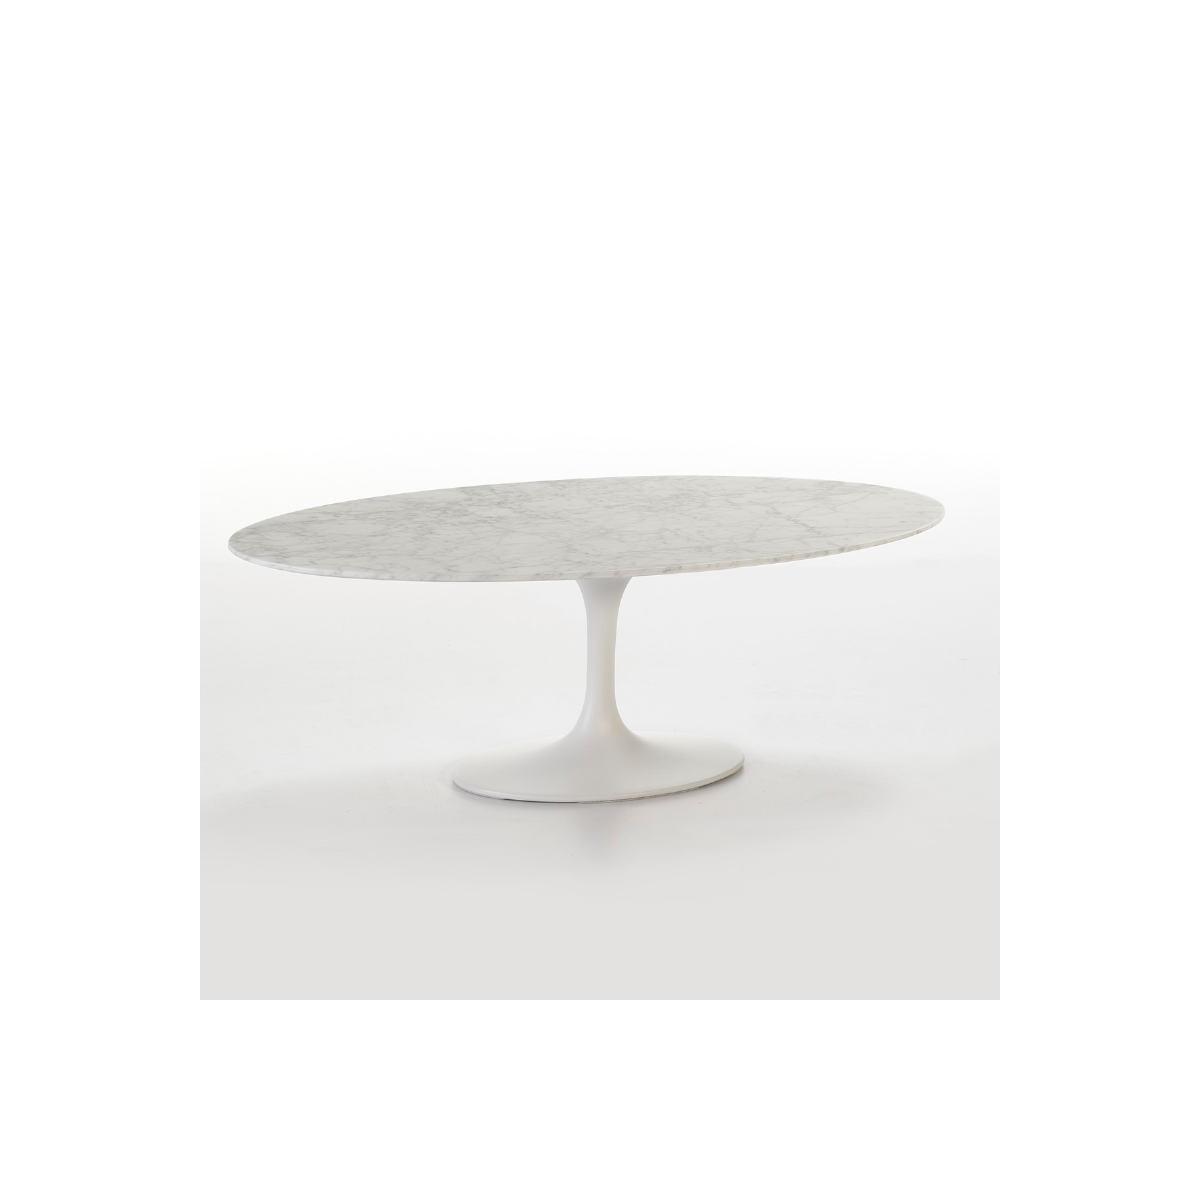 table basse 120x60x42 marbre fibre de verre blanc amp story 7305